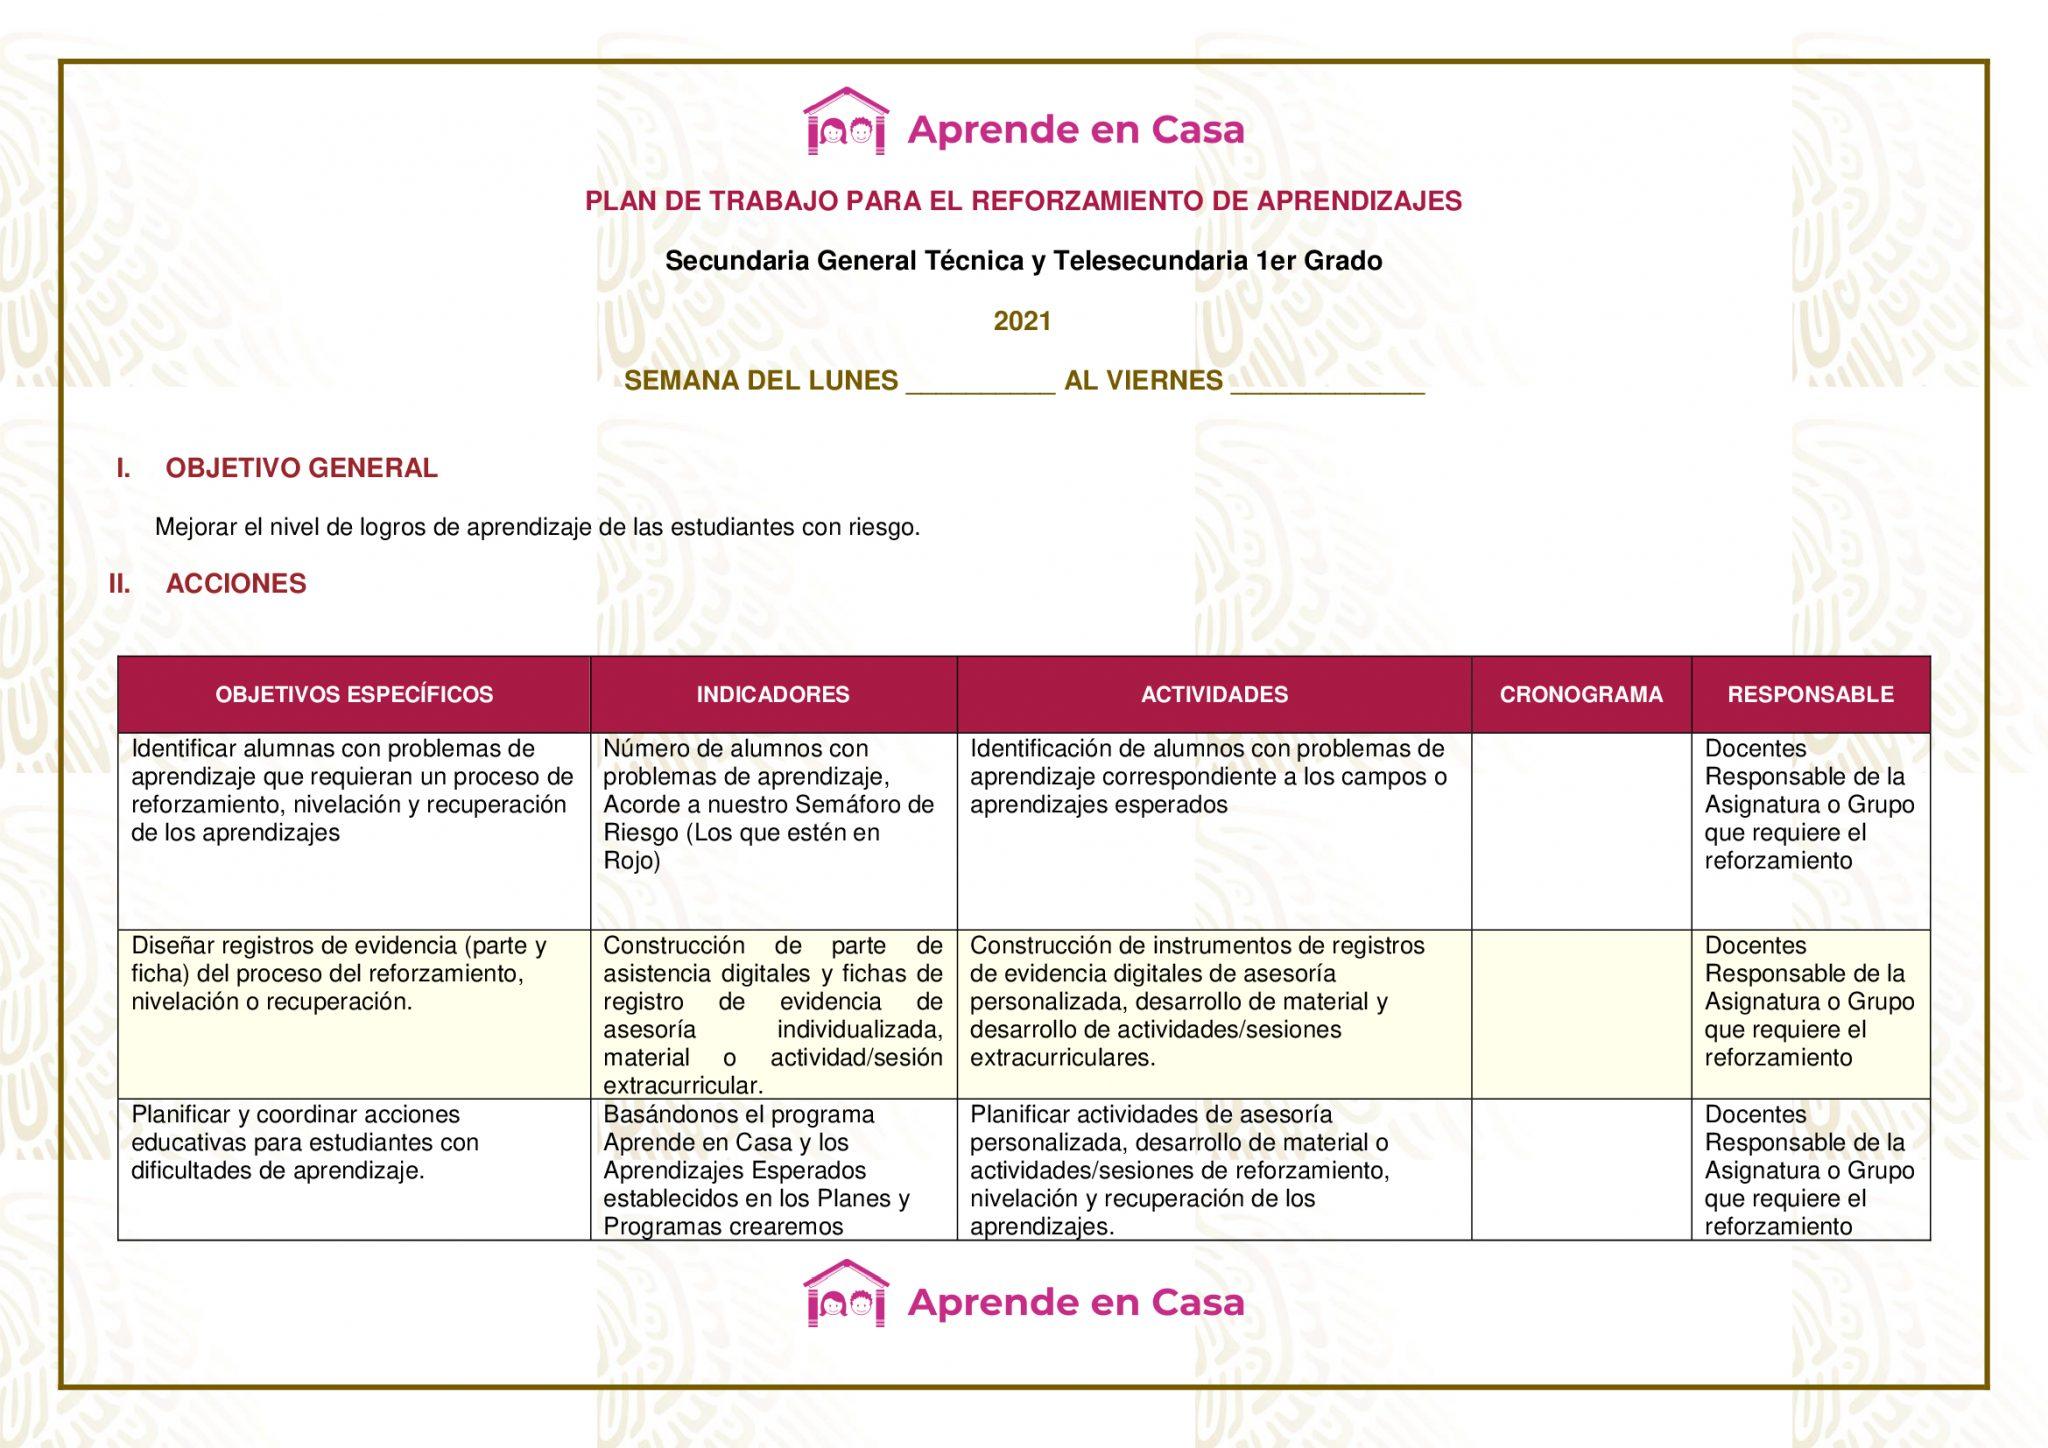 Plan de reforzamiento para Secundaria Generales, Técnicas y Telesecundaria, (1er Grado)